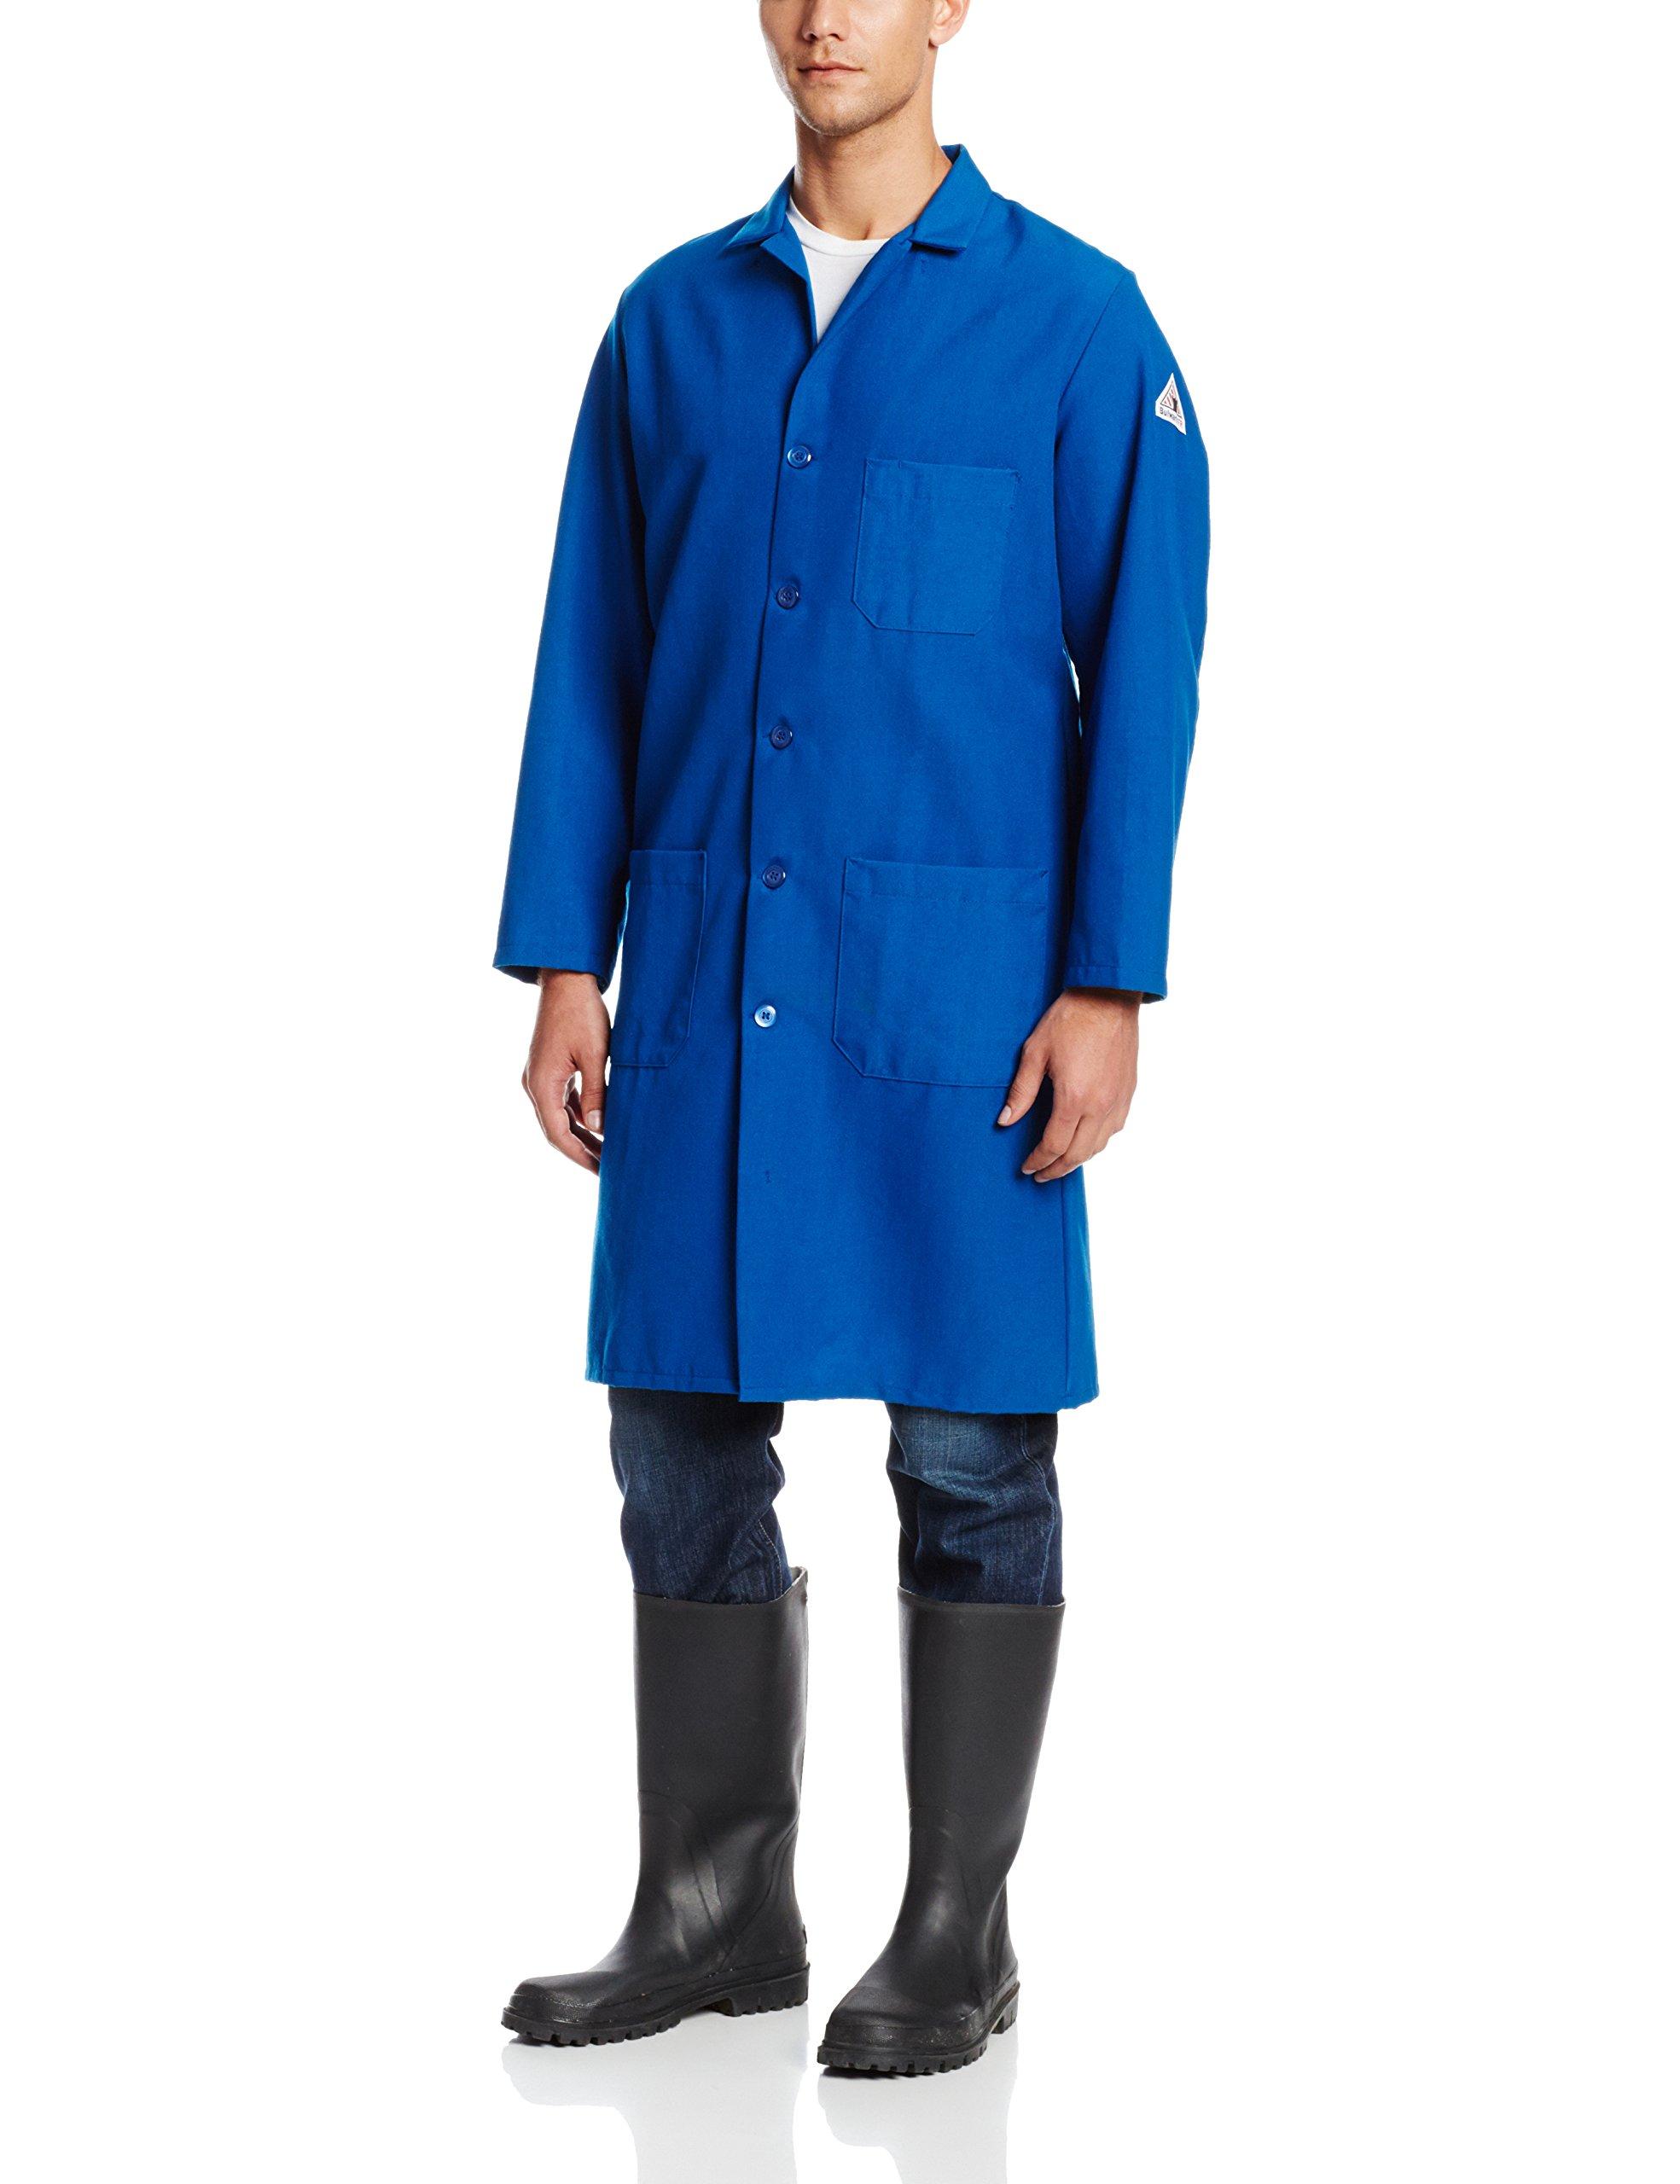 Bulwark Flame Resistant 6 oz Nomex IIIA Lapel Collar Lab Coat, Royal Blue, Medium